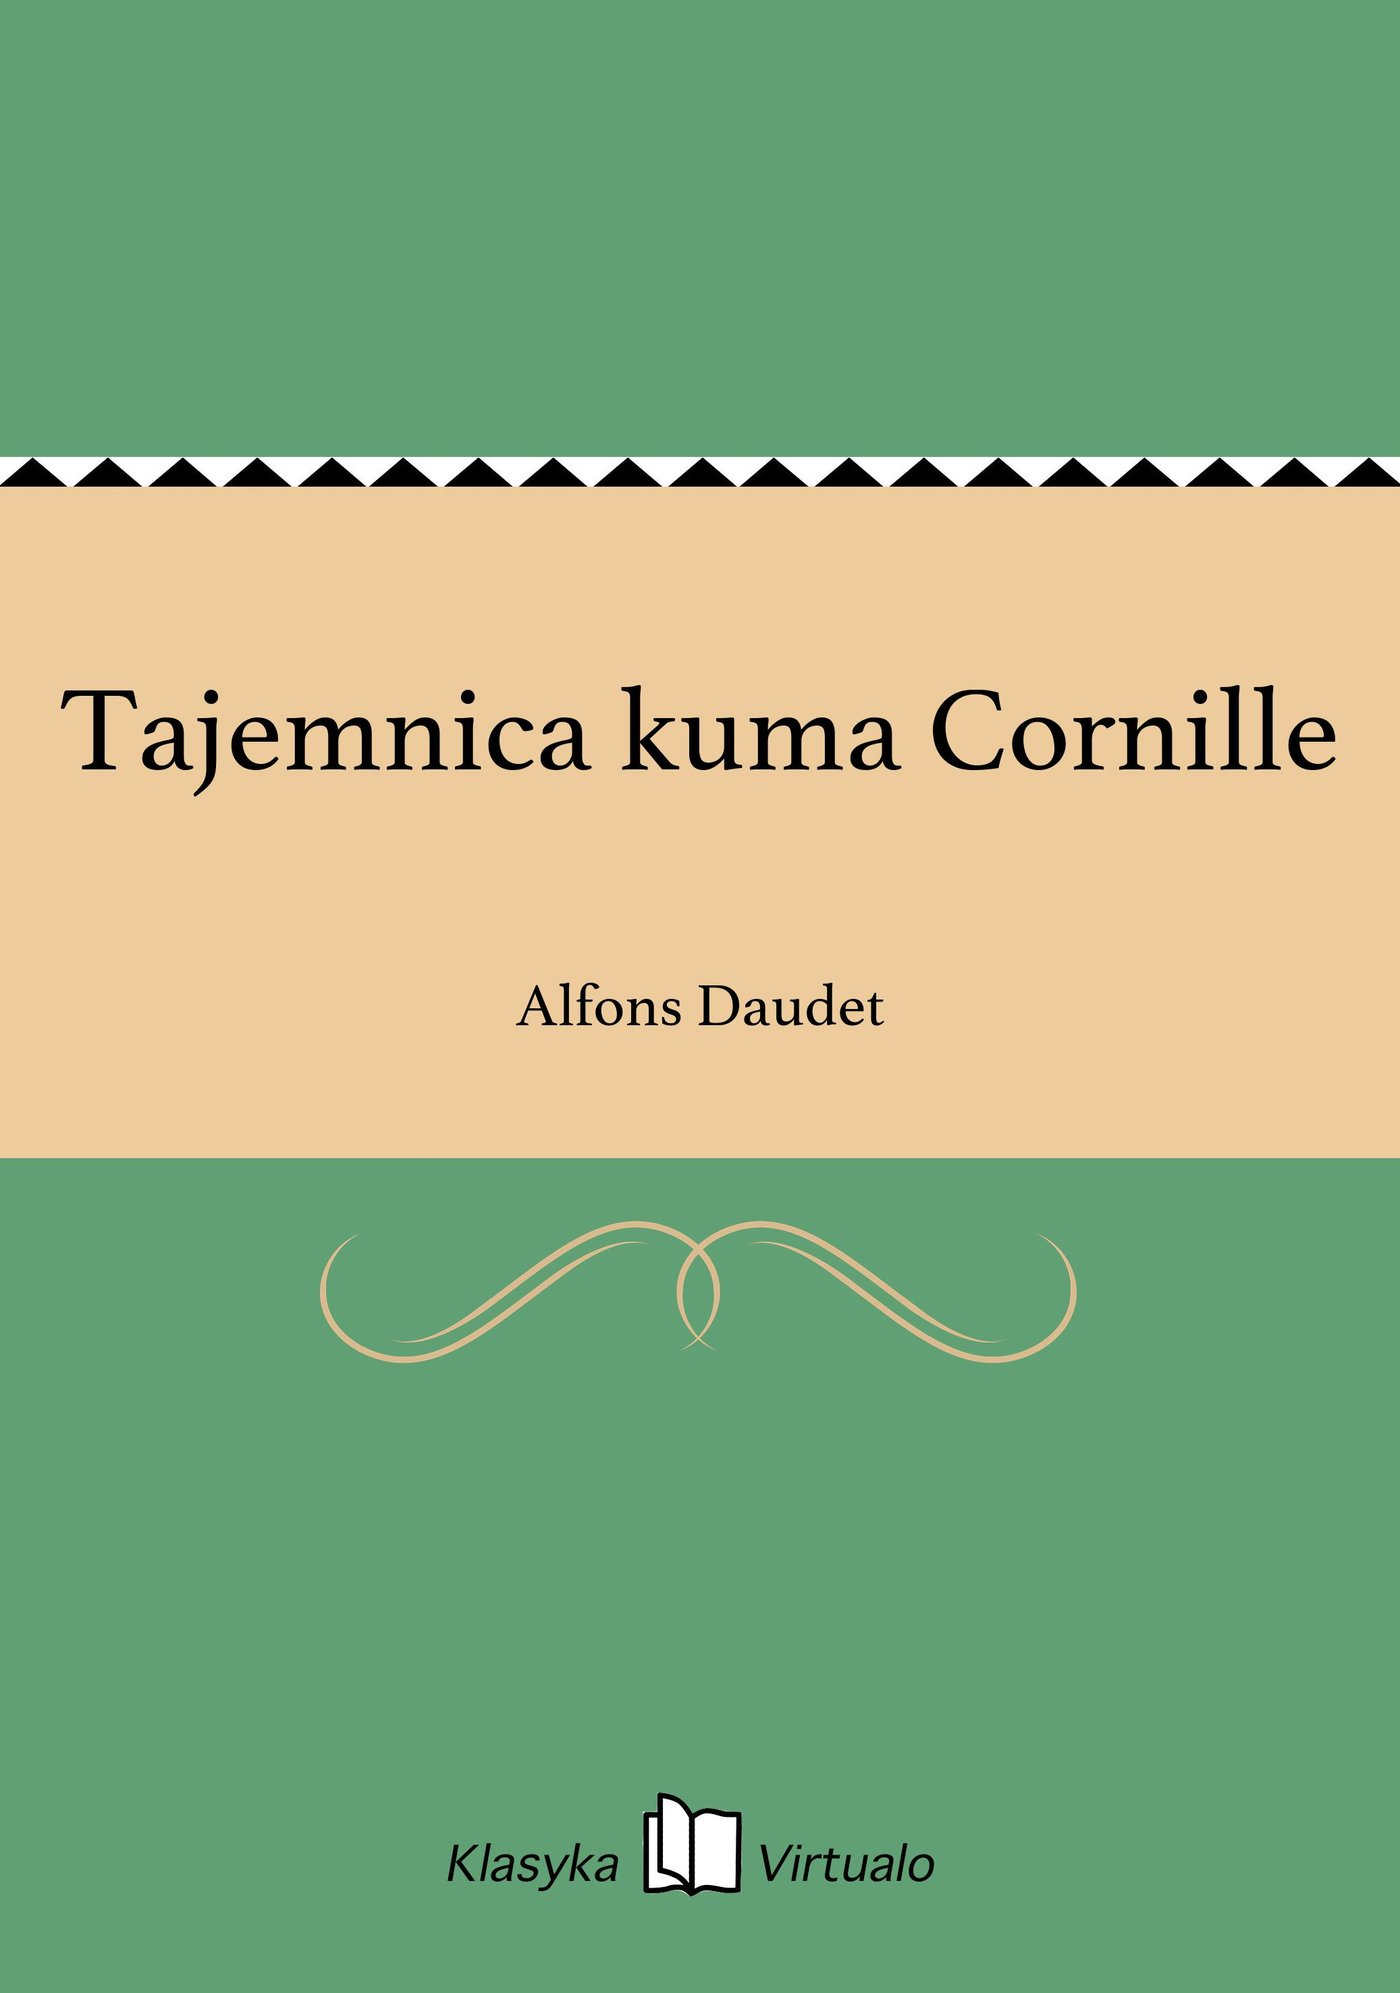 Tajemnica kuma Cornille - Ebook (Książka EPUB) do pobrania w formacie EPUB